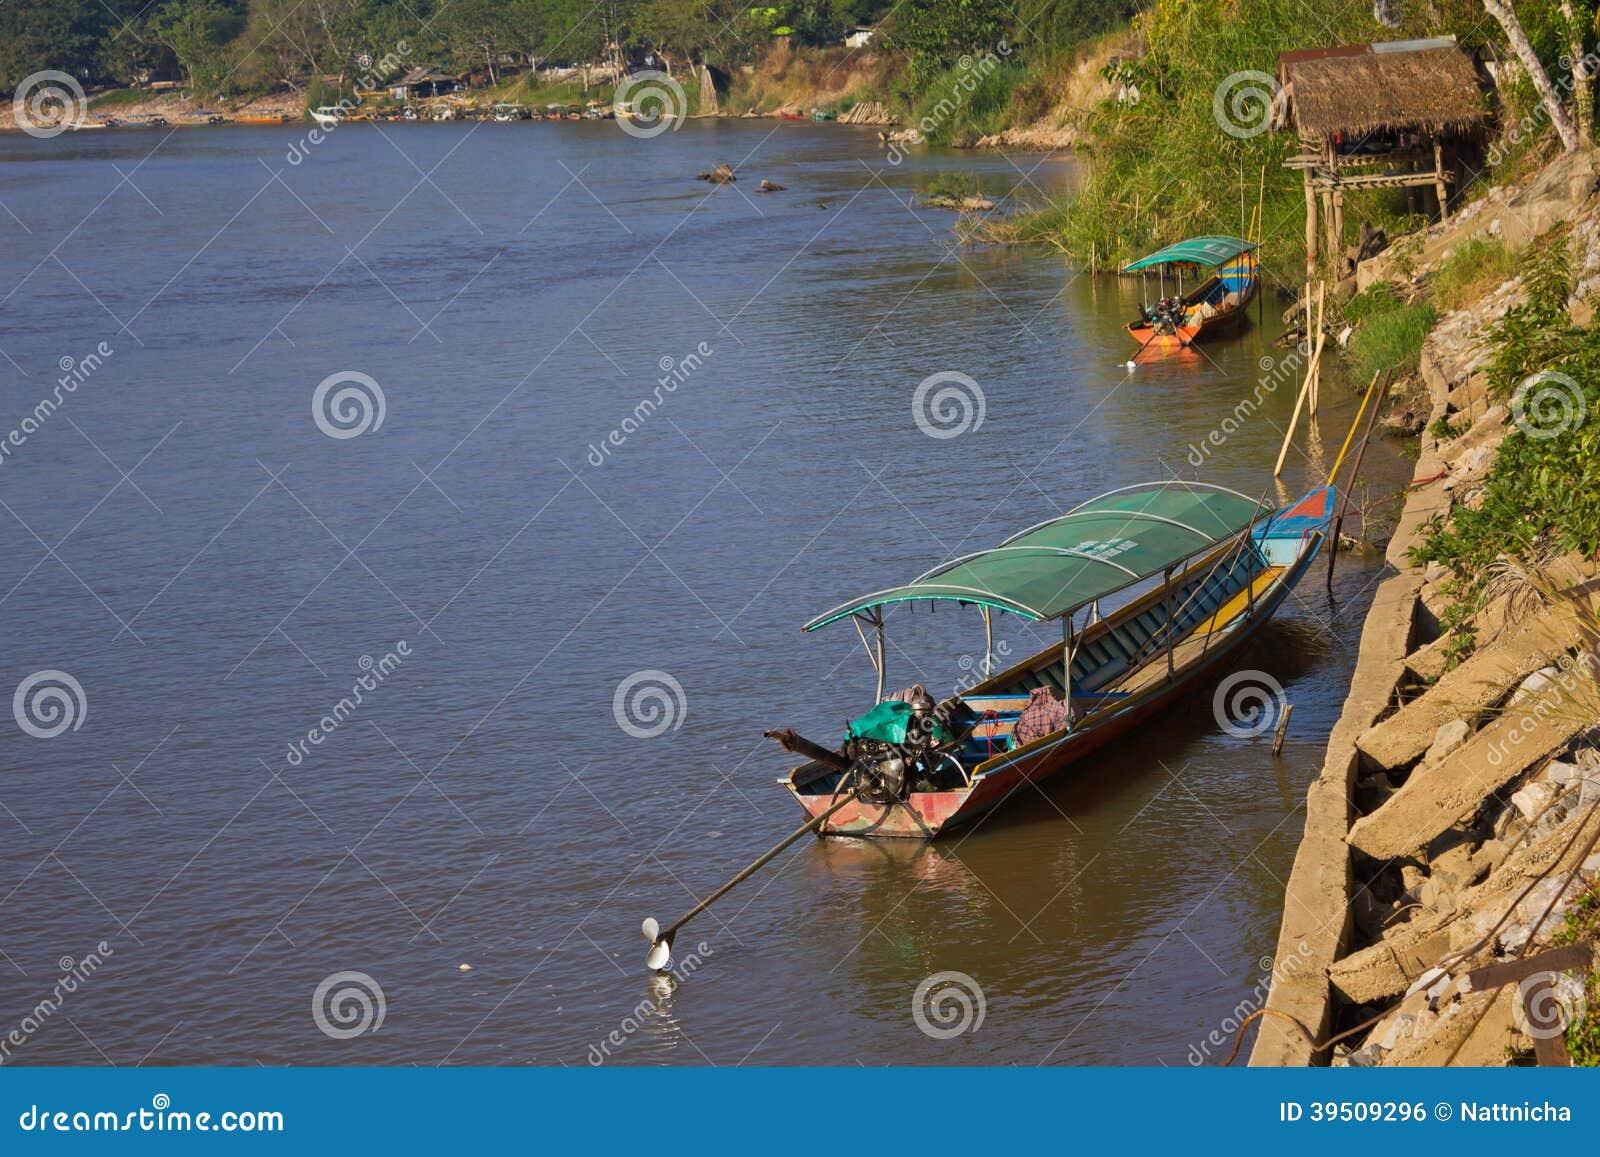 Beautiful scene of Kok River at Chiang Rai province.